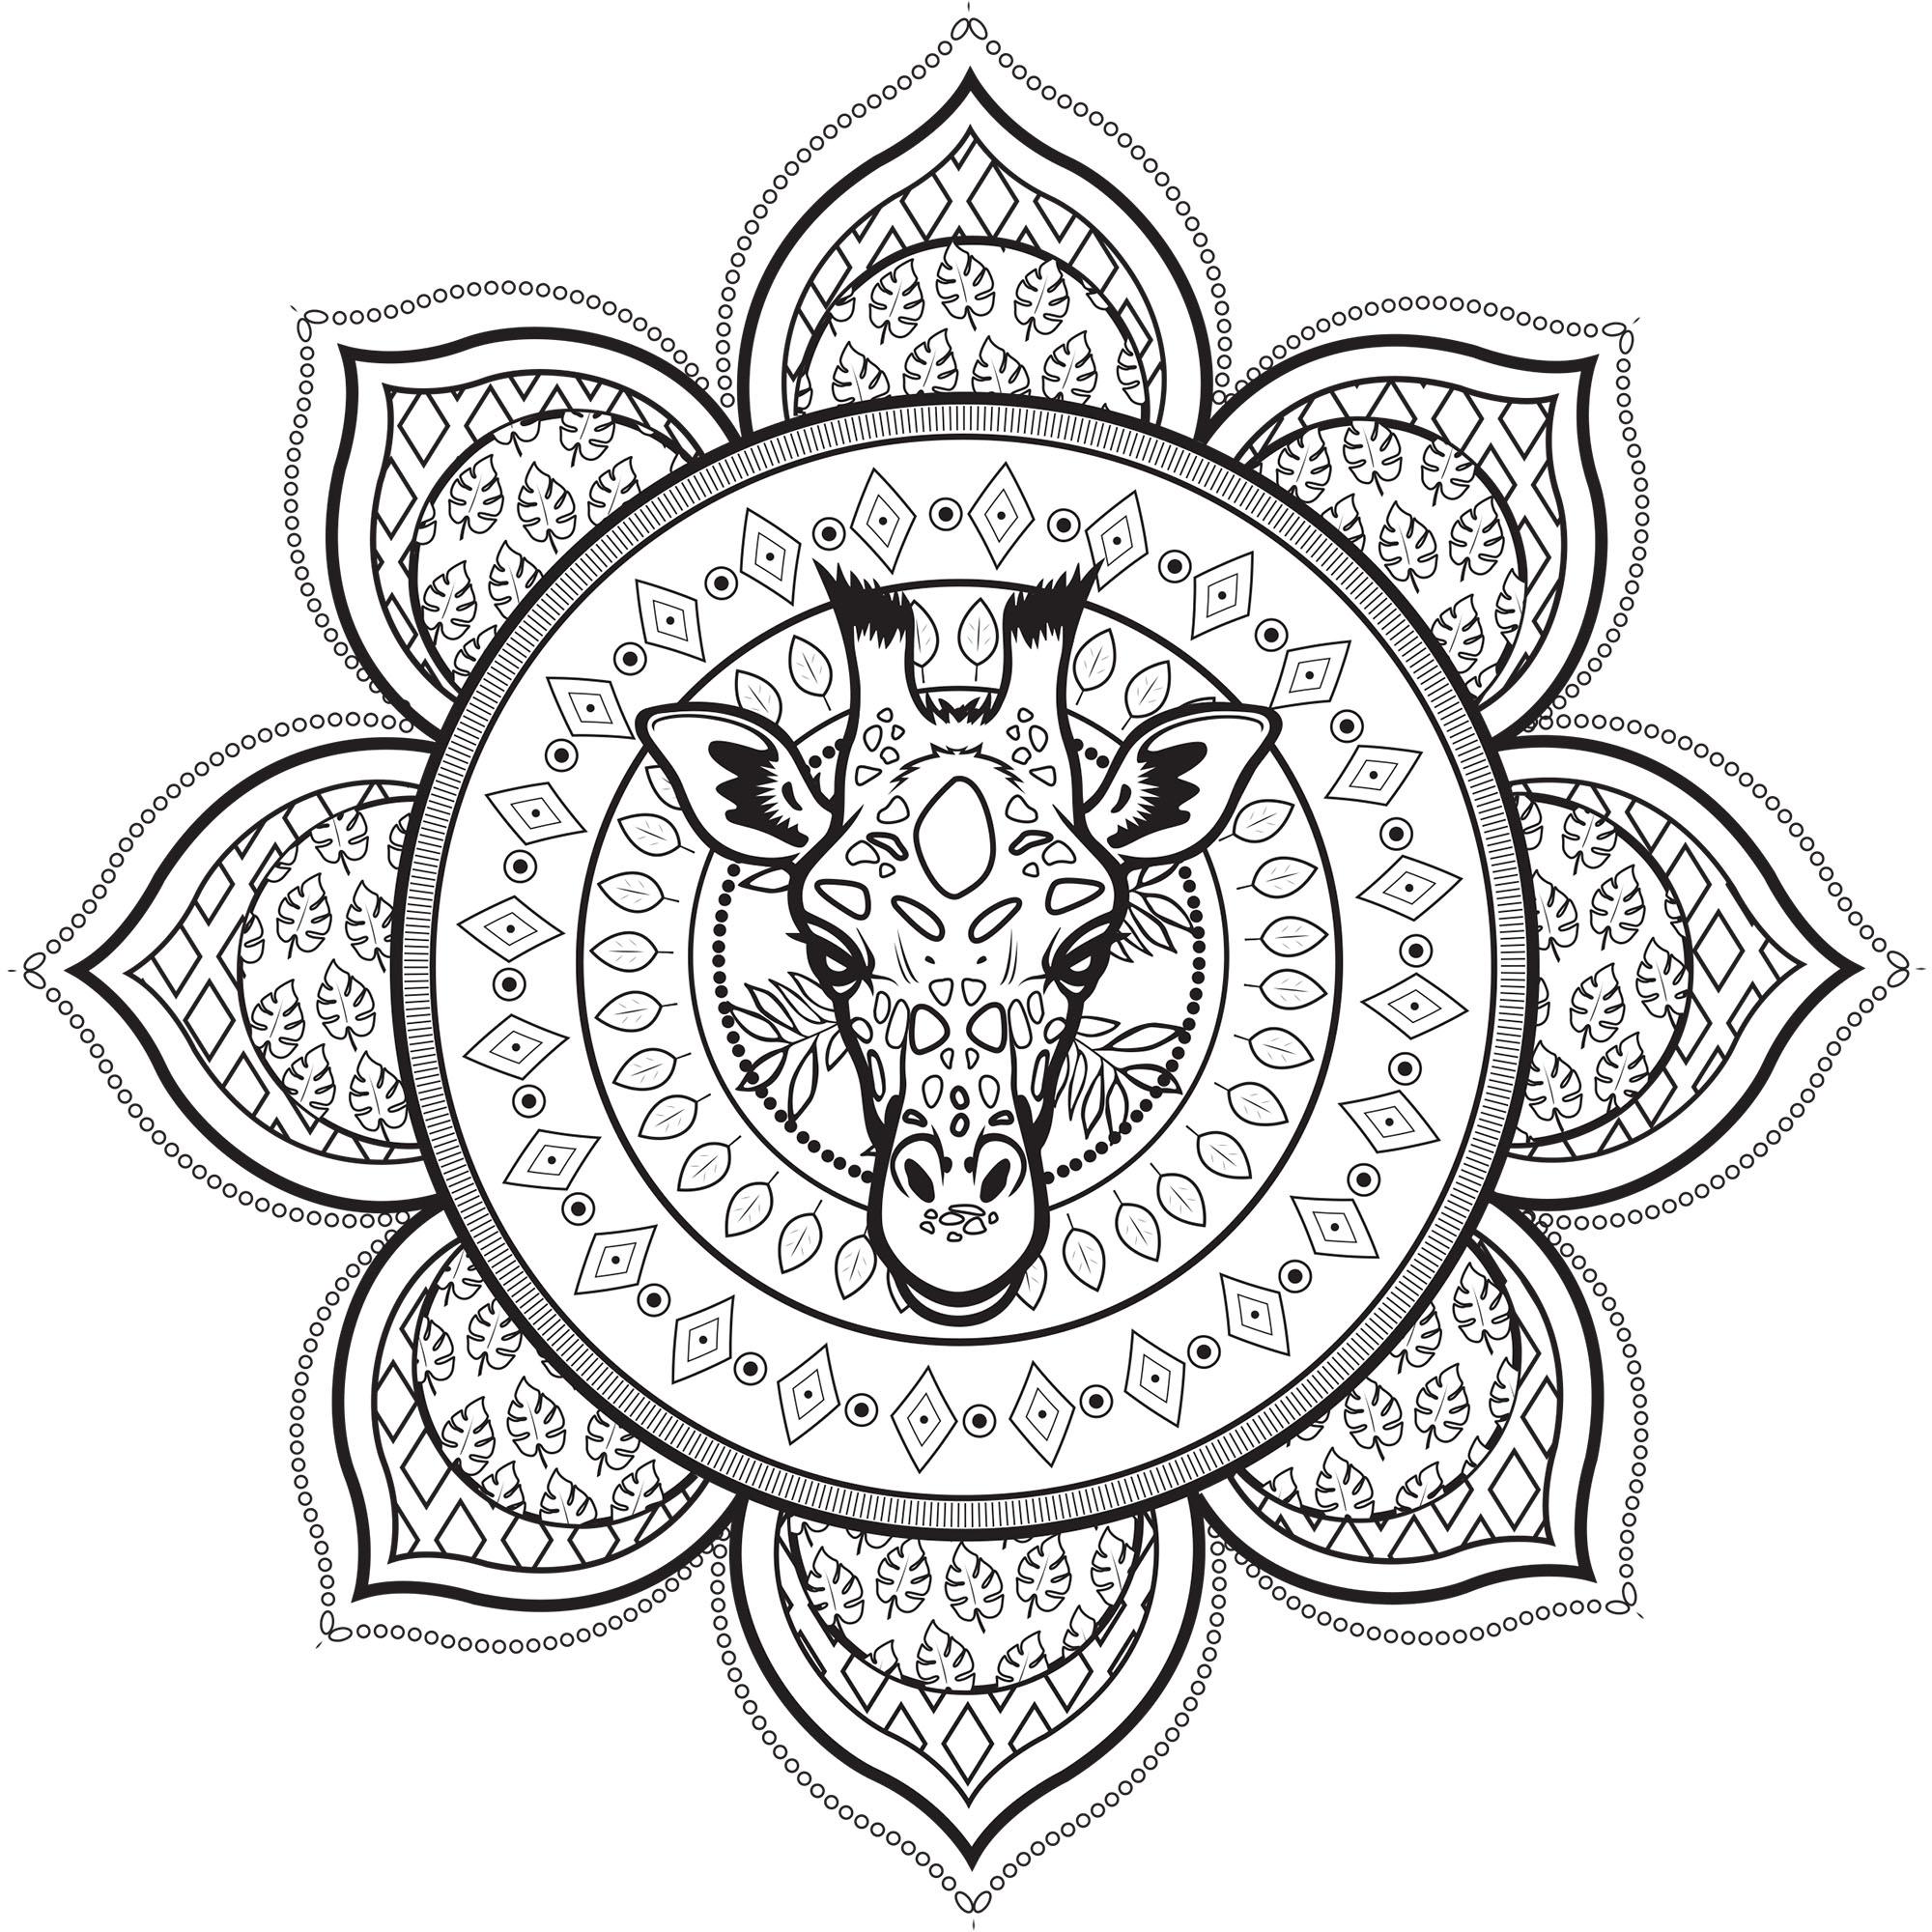 Coloriage Girafe Mandala.Mandala Girafe Mandalas Coloriages Difficiles Pour Adultes